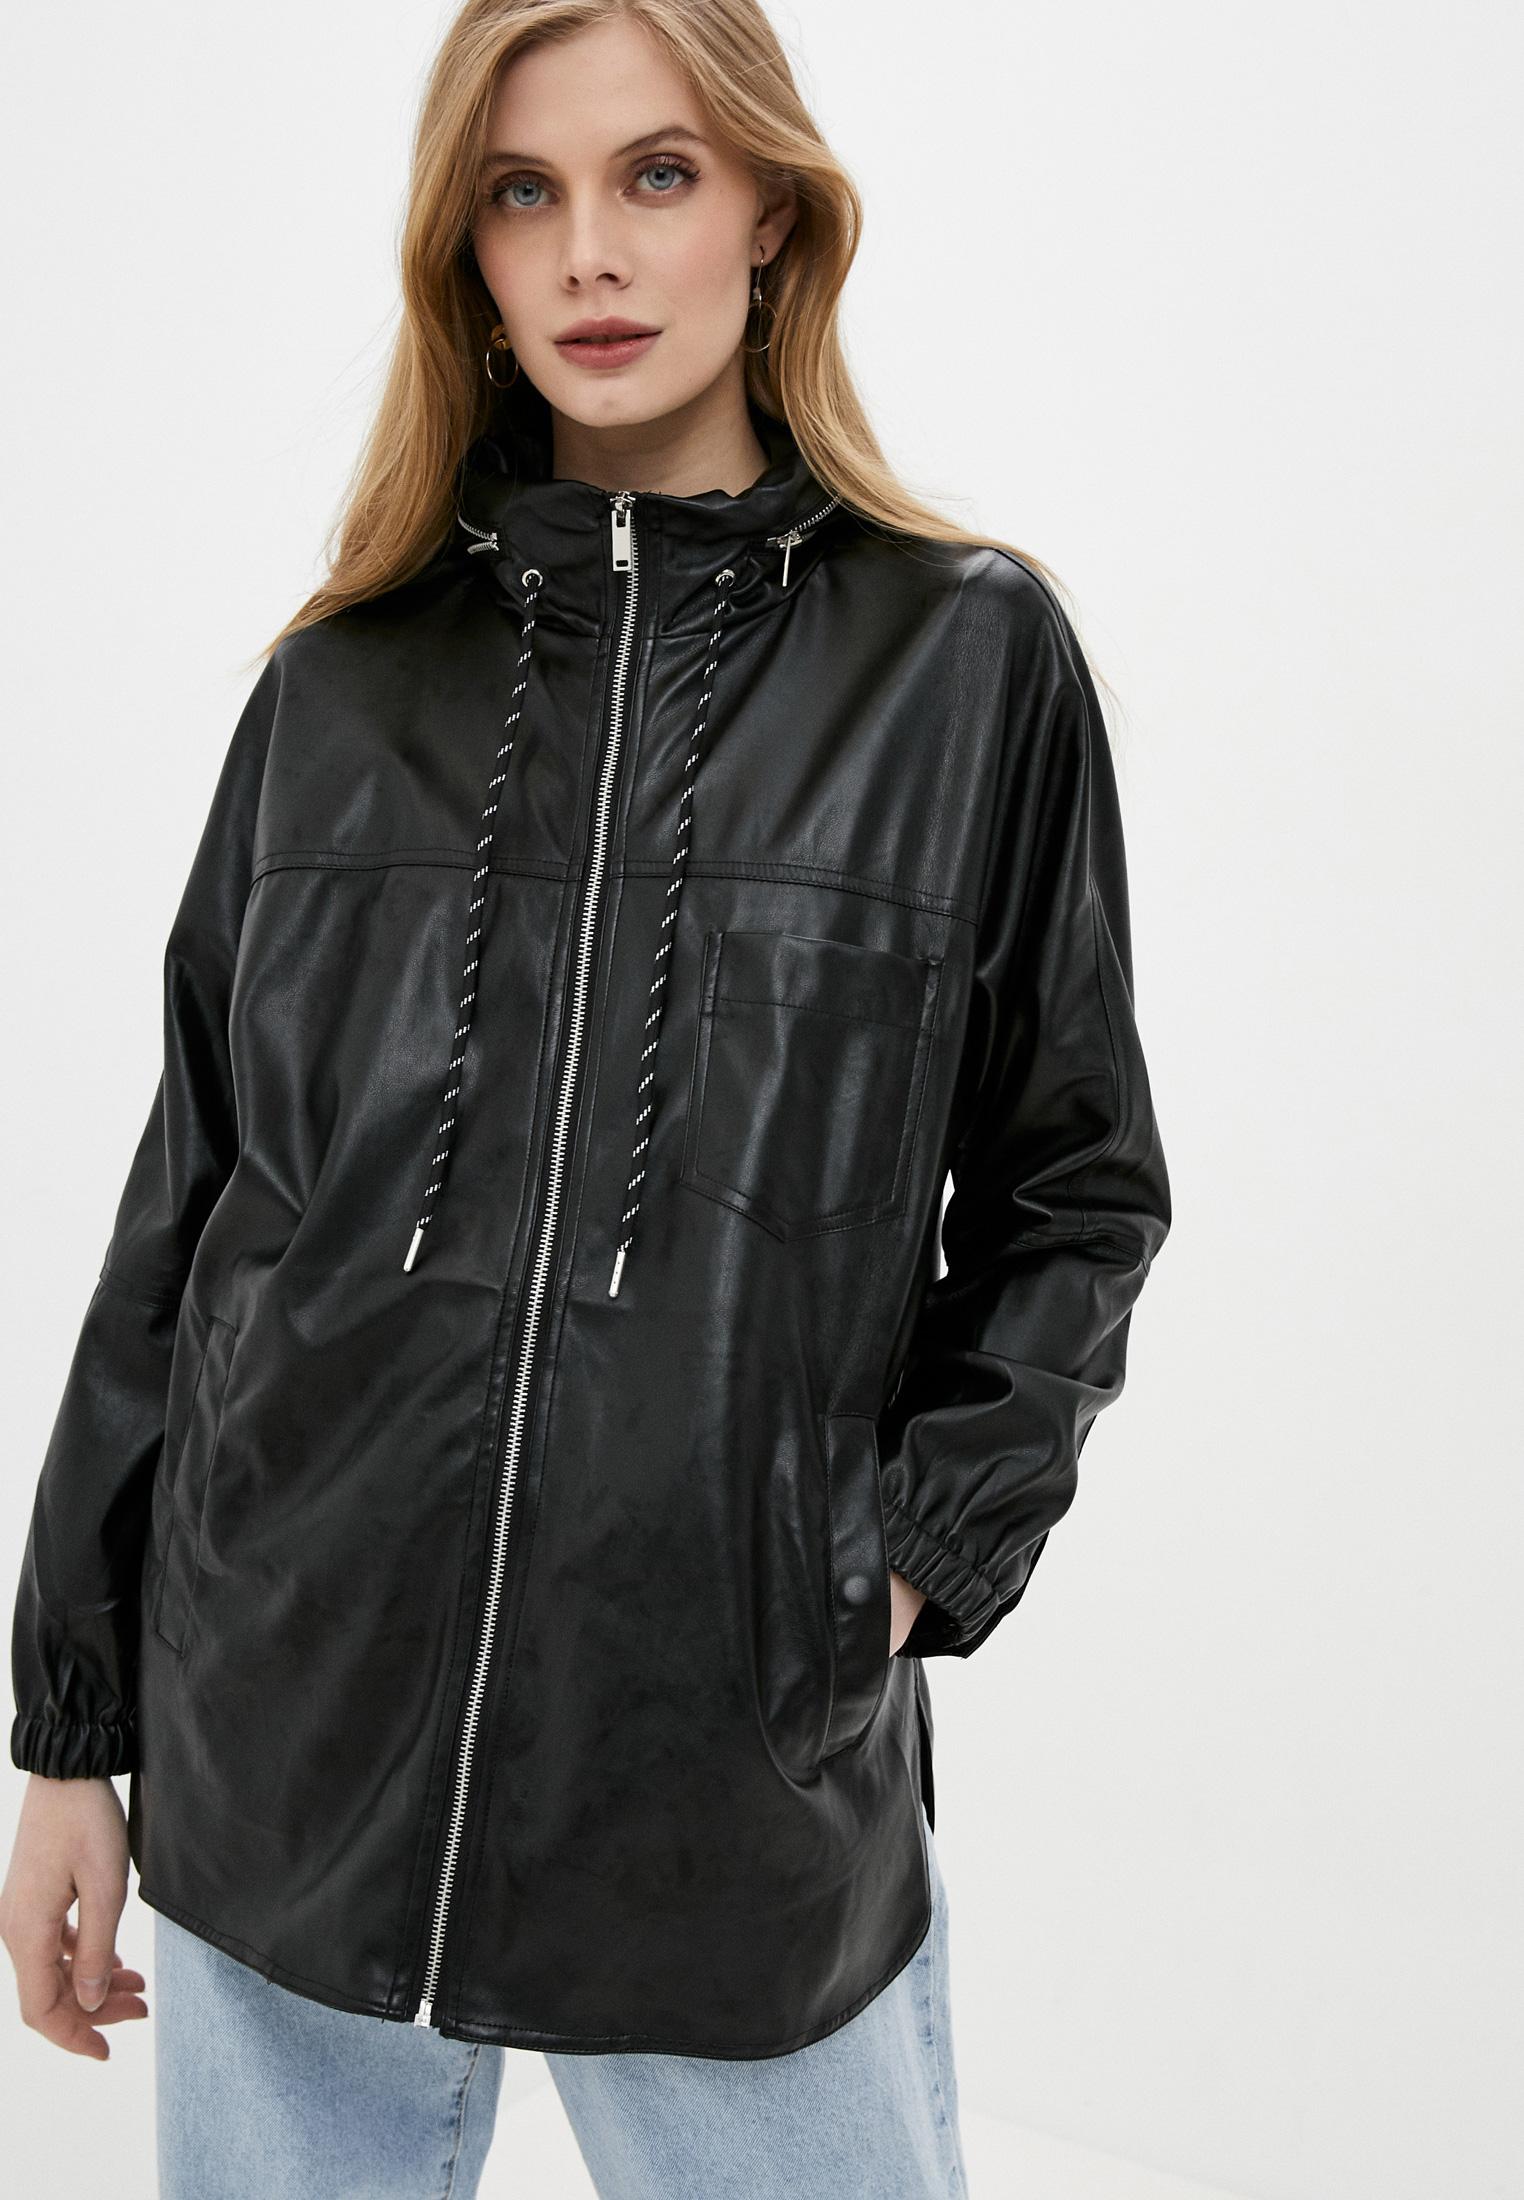 Кожаная куртка Softy S20503